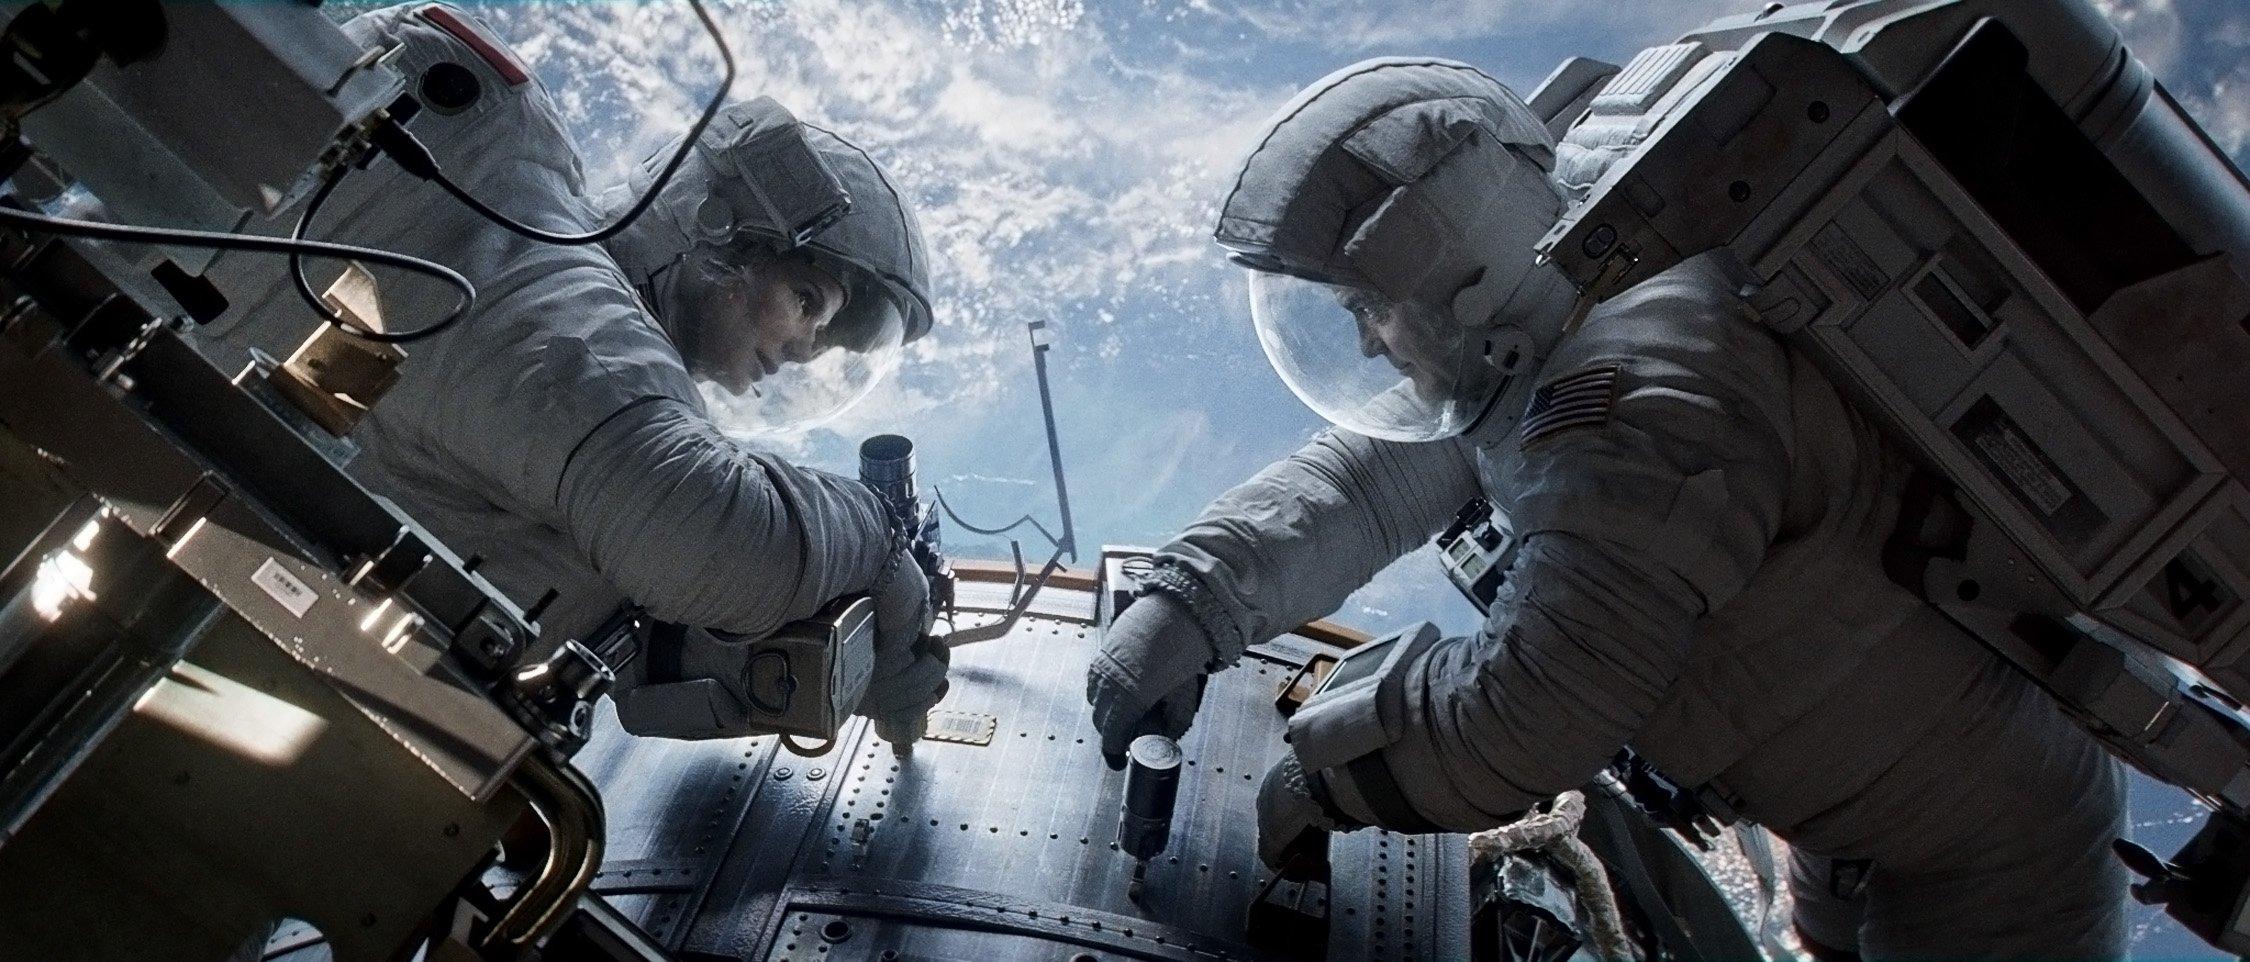 GRAVITY Drama Sci Fi Thriller Space Astronaut Spaceship Planet F Wallpaper